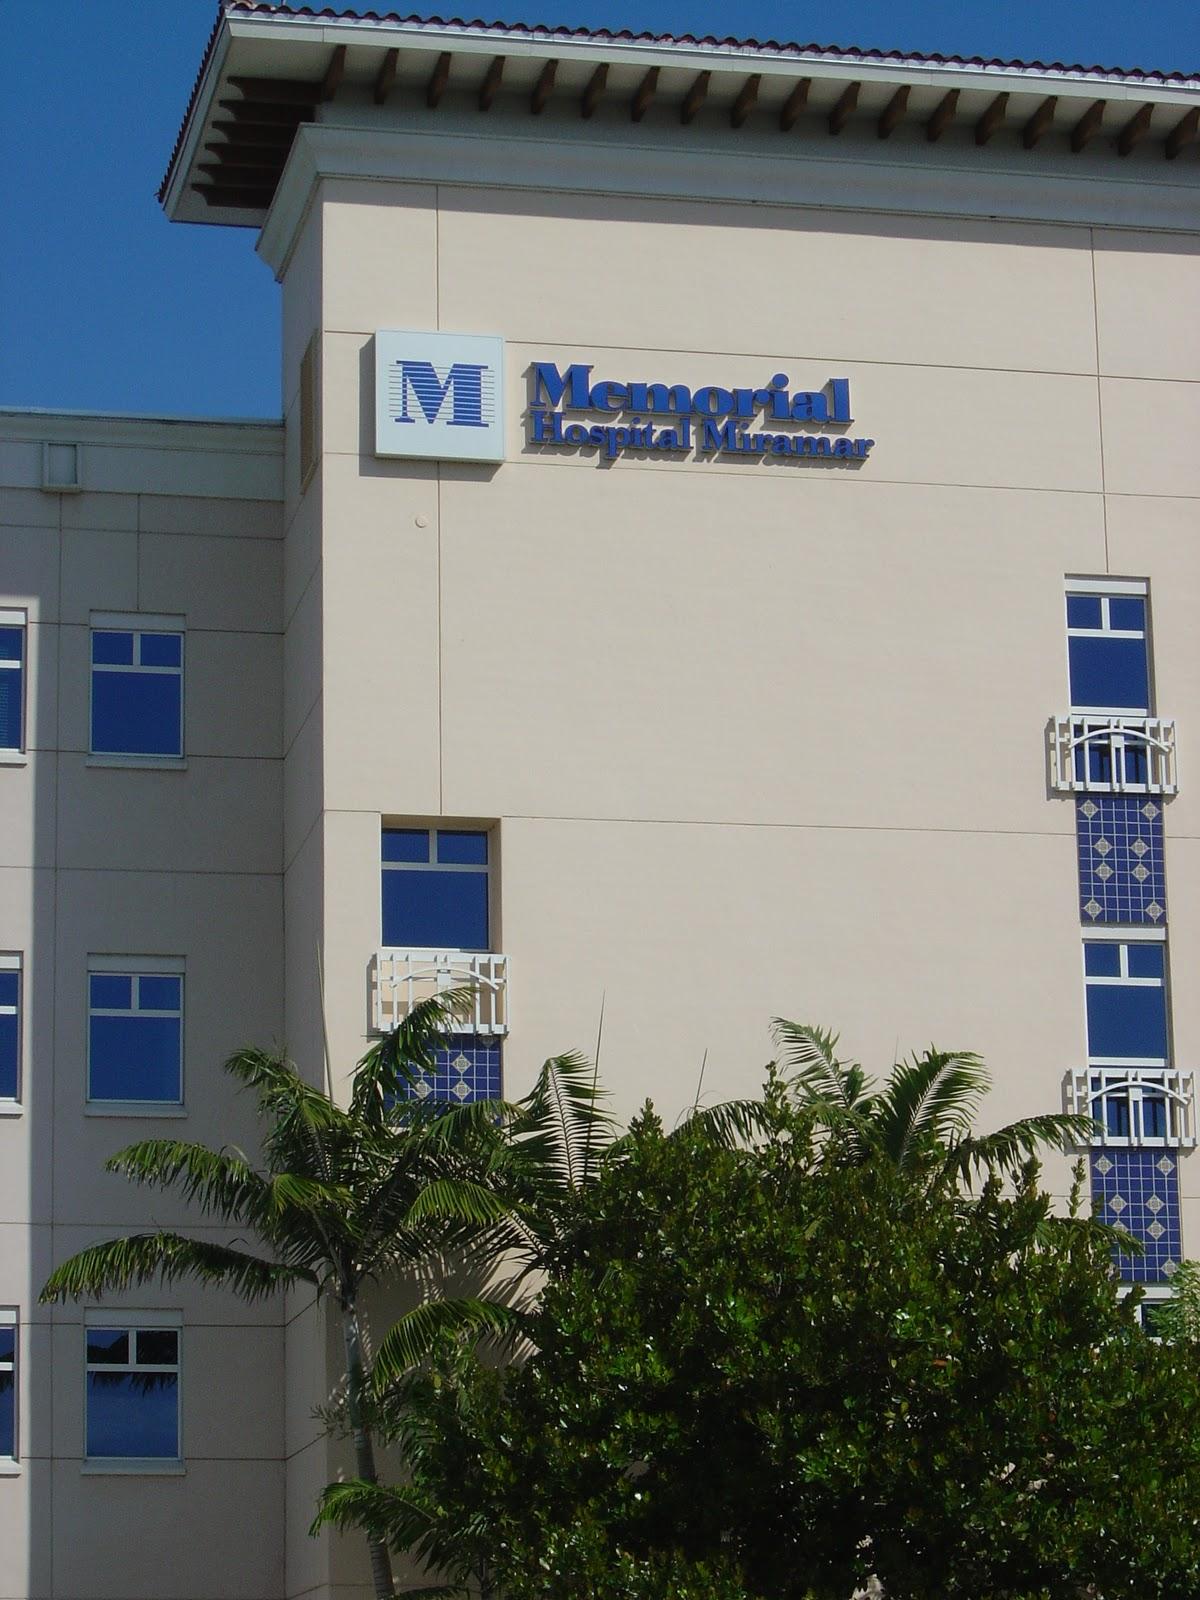 City Of Miramar Florida Memorial Hospital Miramar